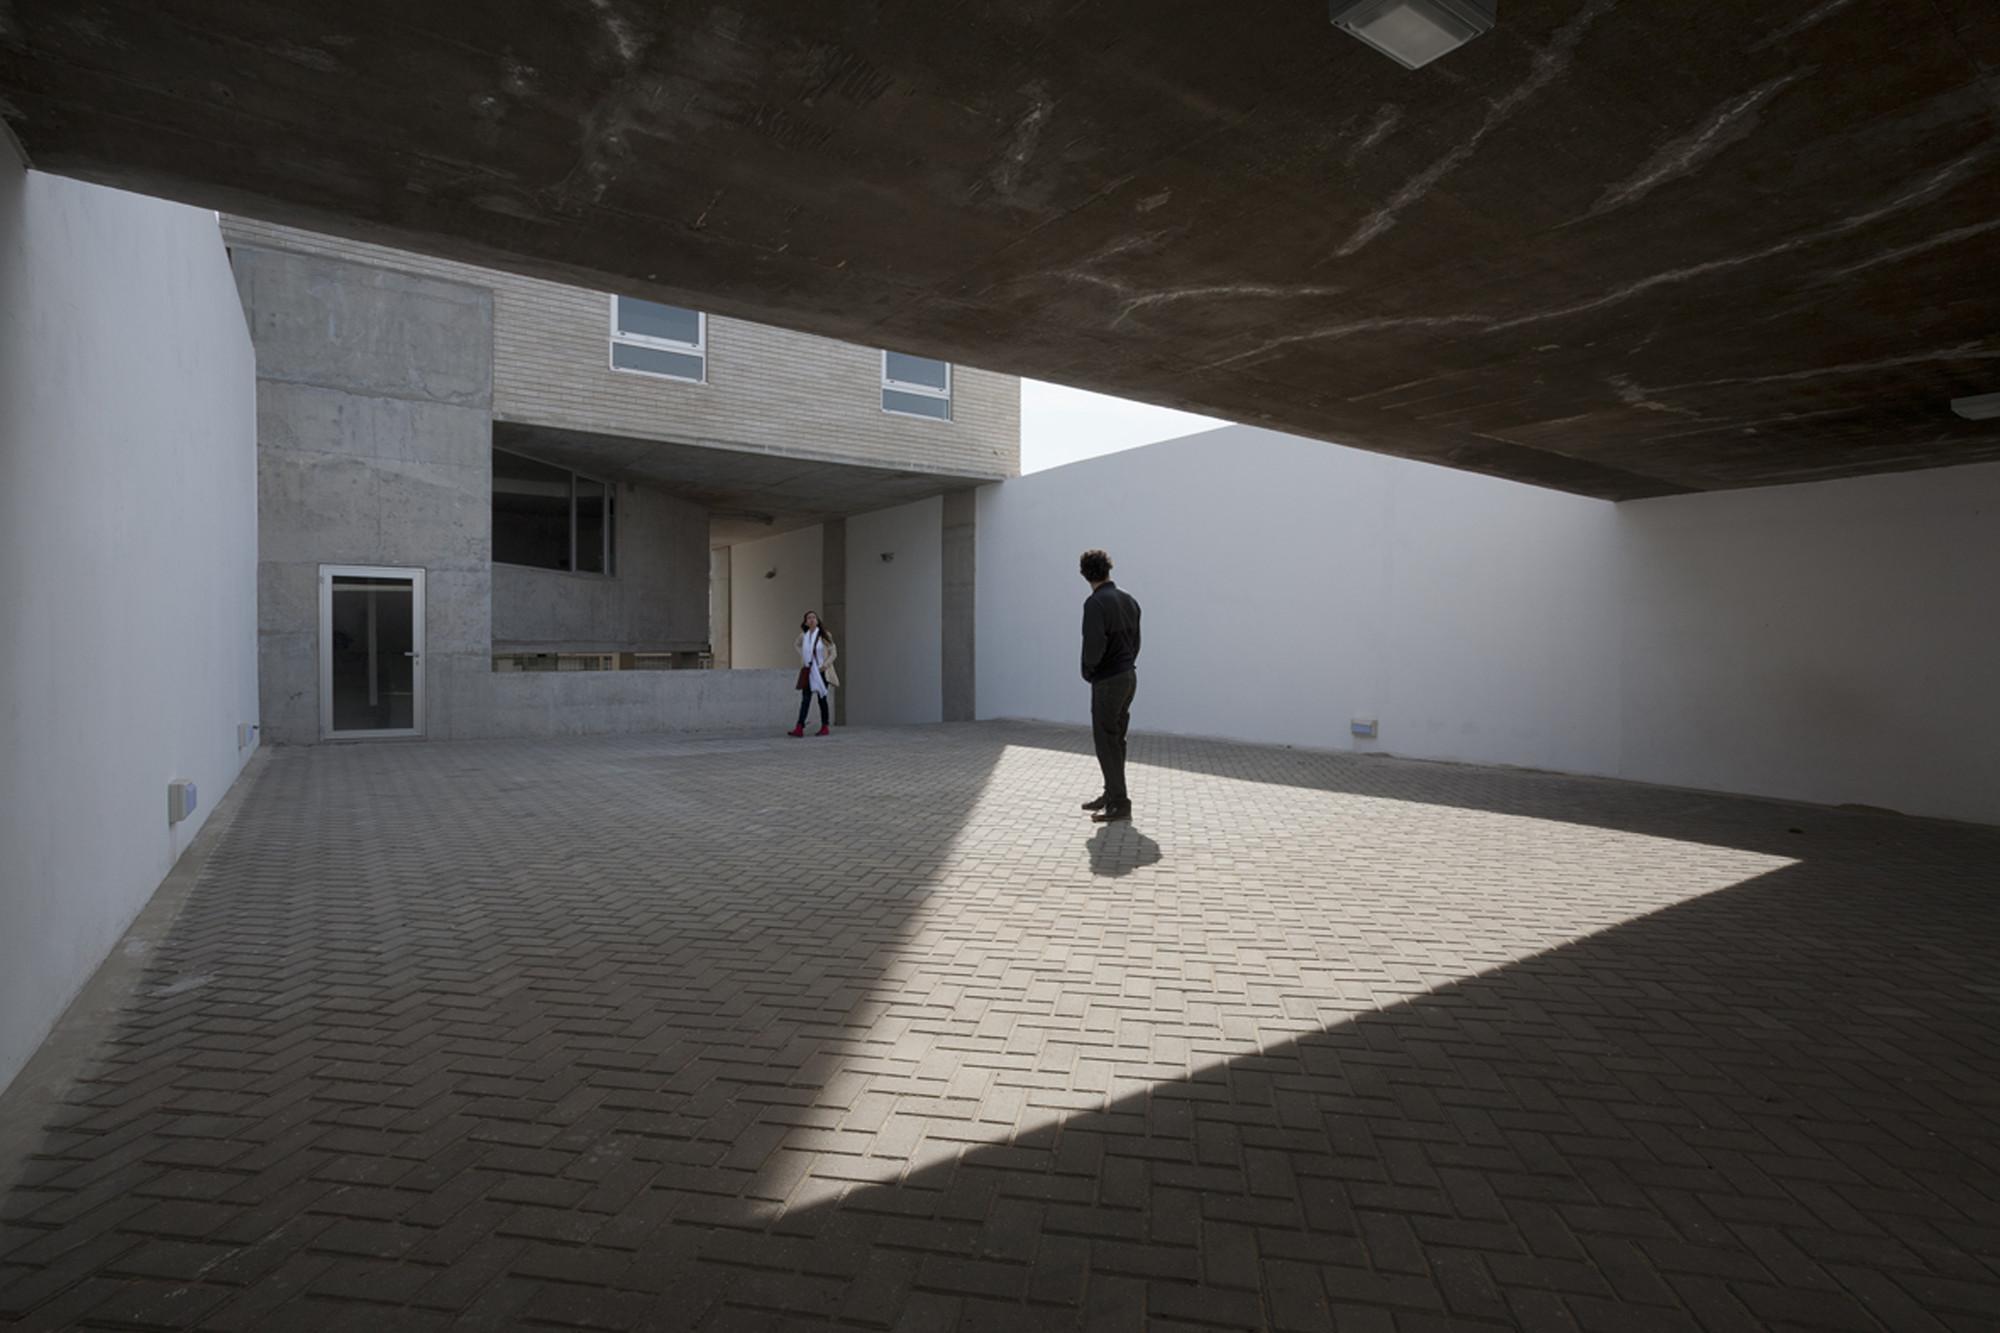 Güemes Building / Gerardo Caballero Maite Fernandez  Arquitectos, © Gustavo Frittegotto